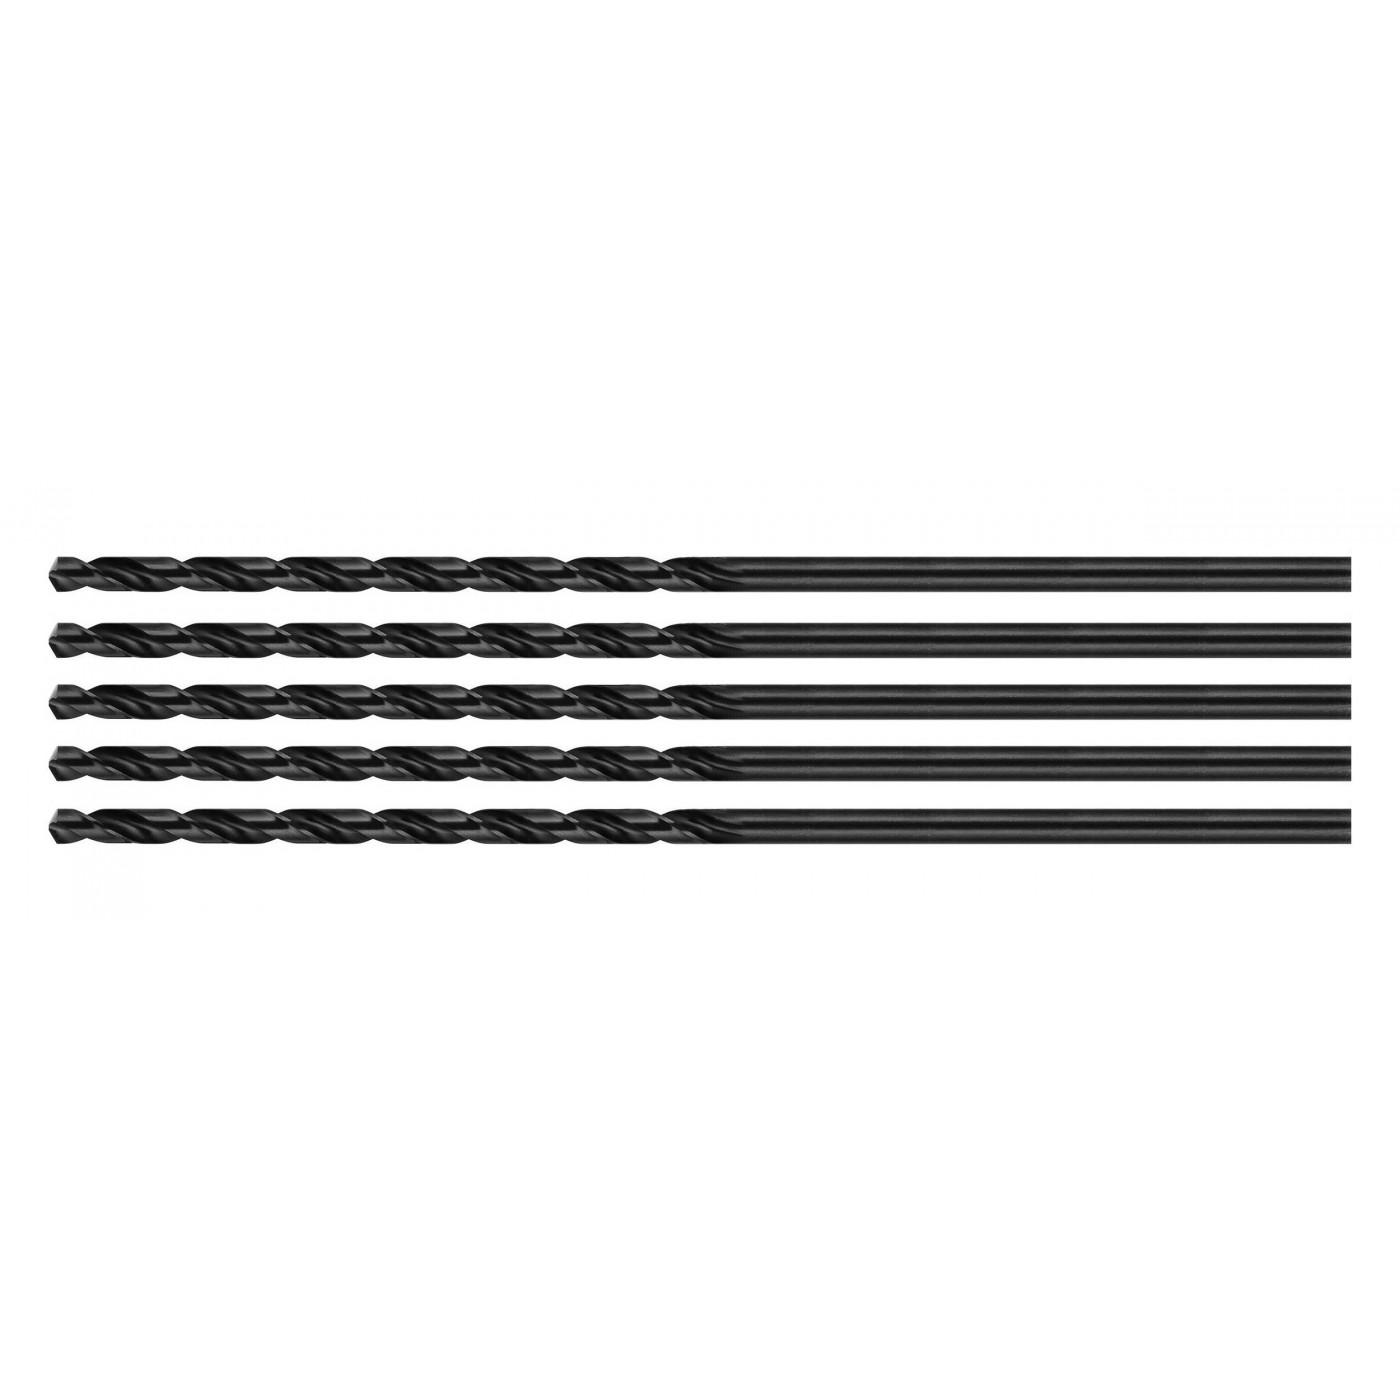 Set of 5 metal drill bits, extra long (3.5x300 mm)